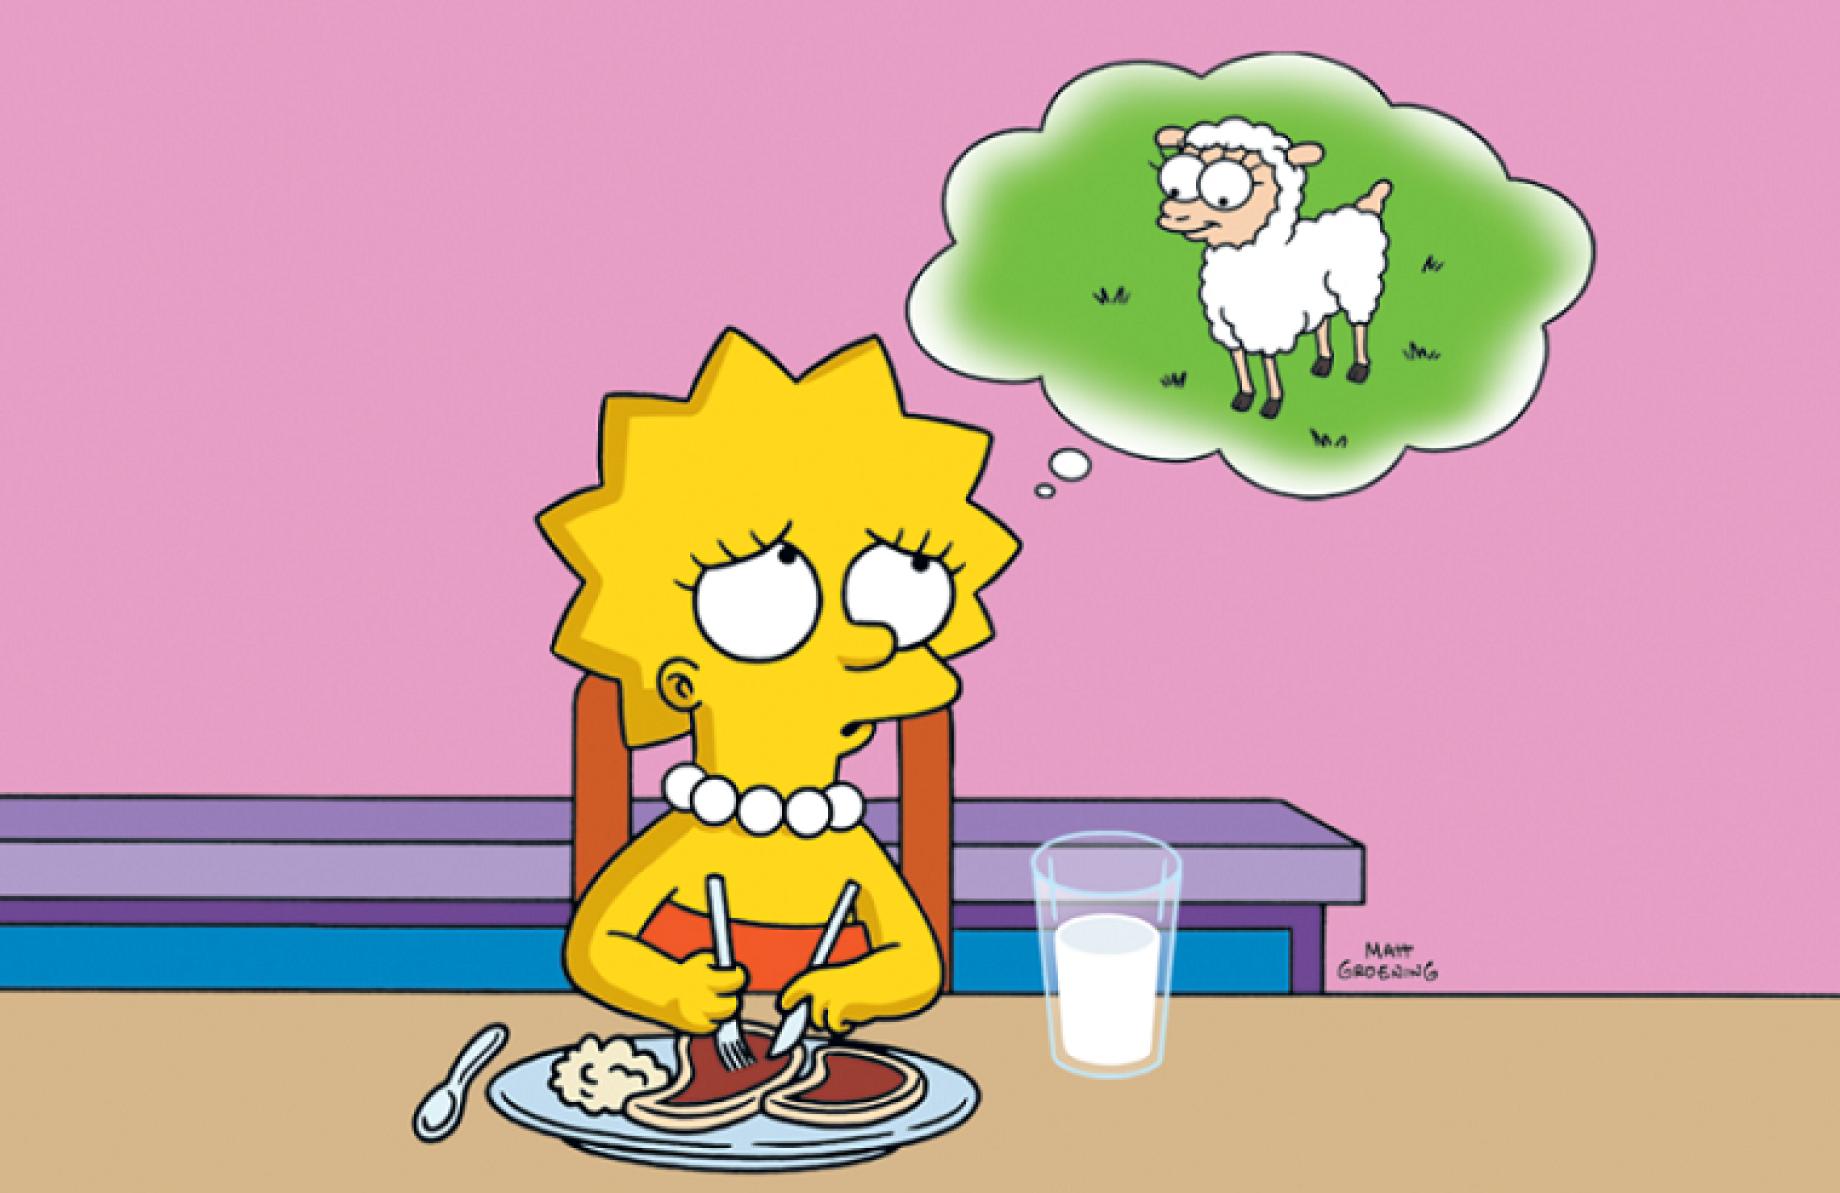 Lisa_the_vegetarian-800x519_rid